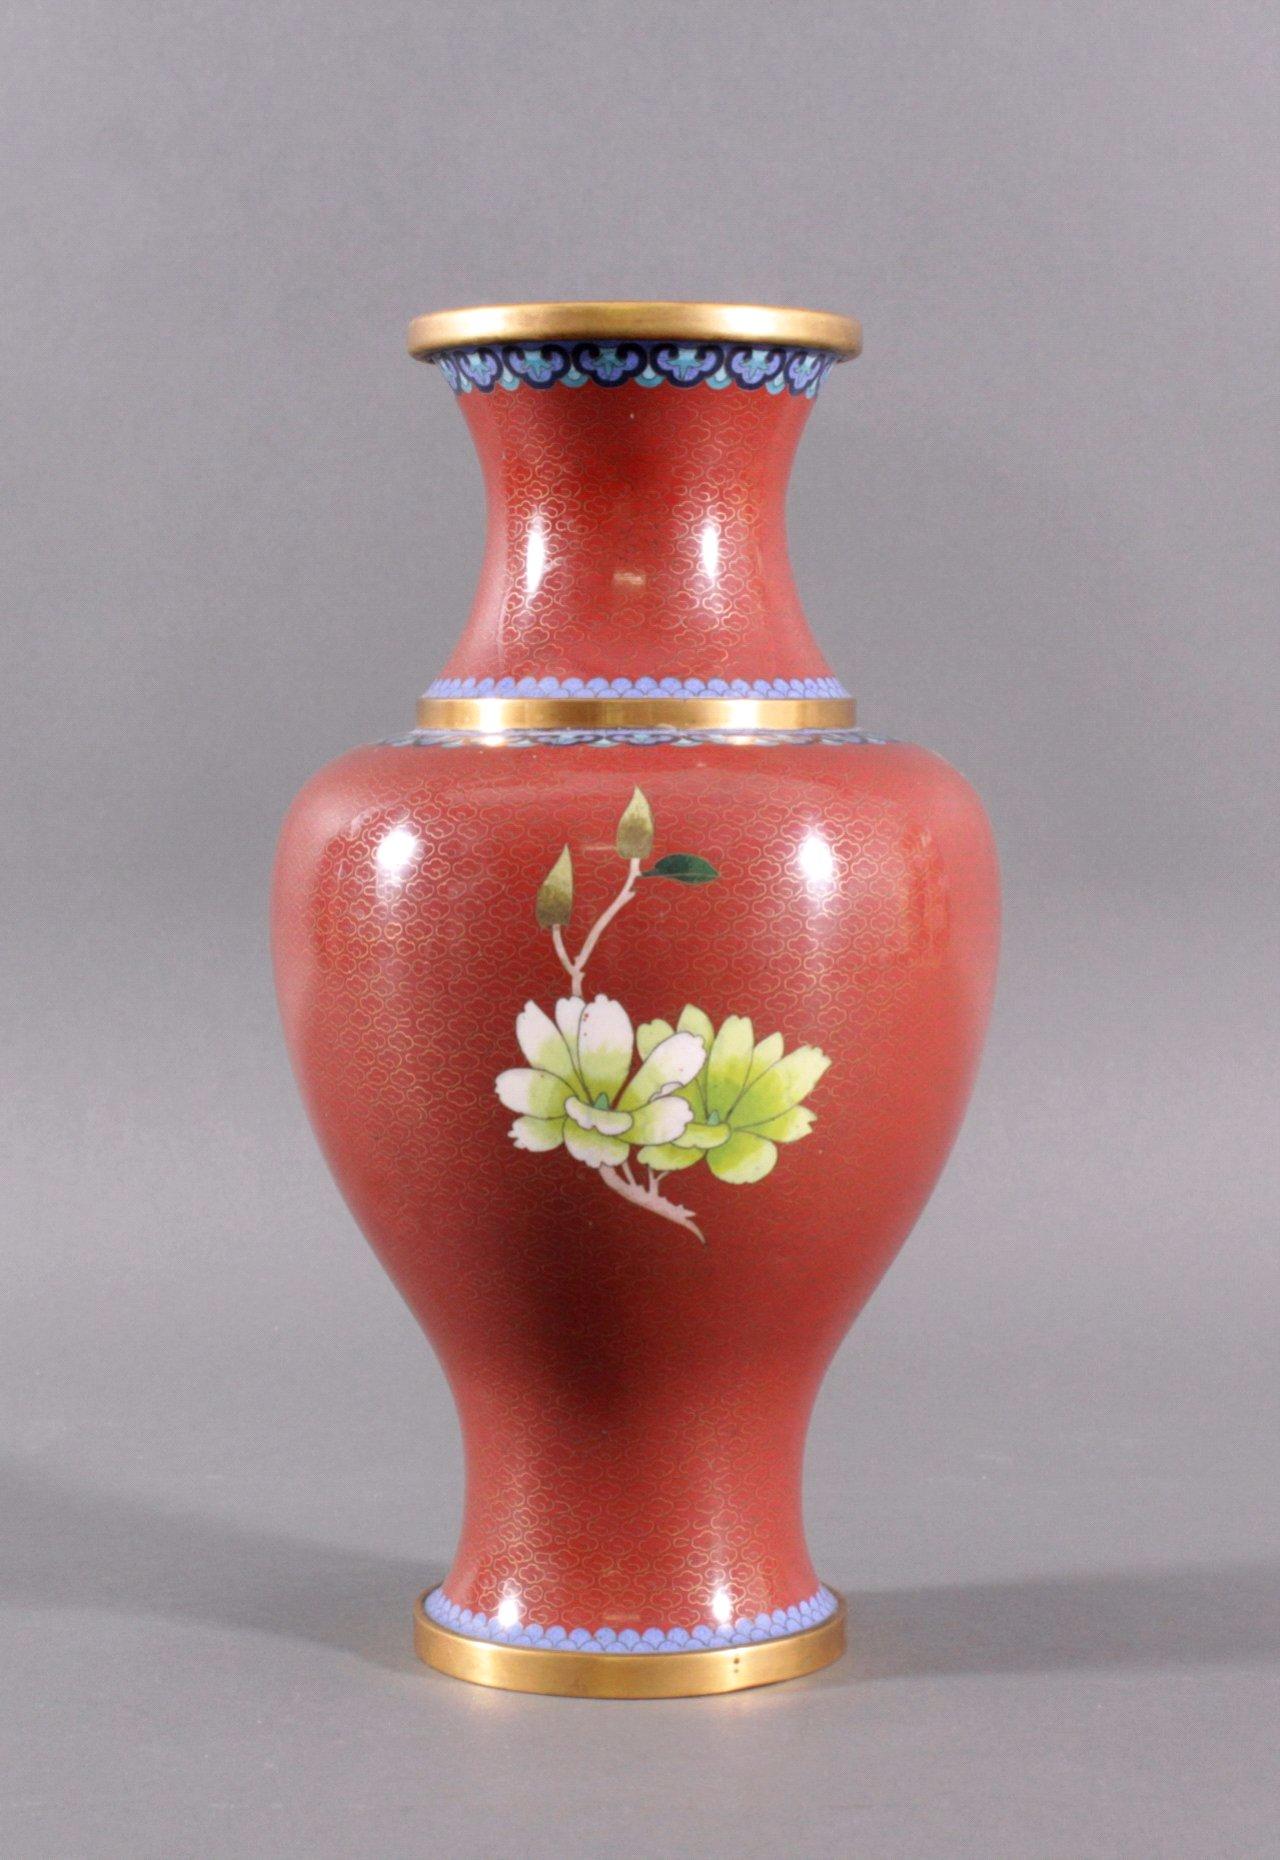 gro e cloisonne vase badisches auktionshaus. Black Bedroom Furniture Sets. Home Design Ideas